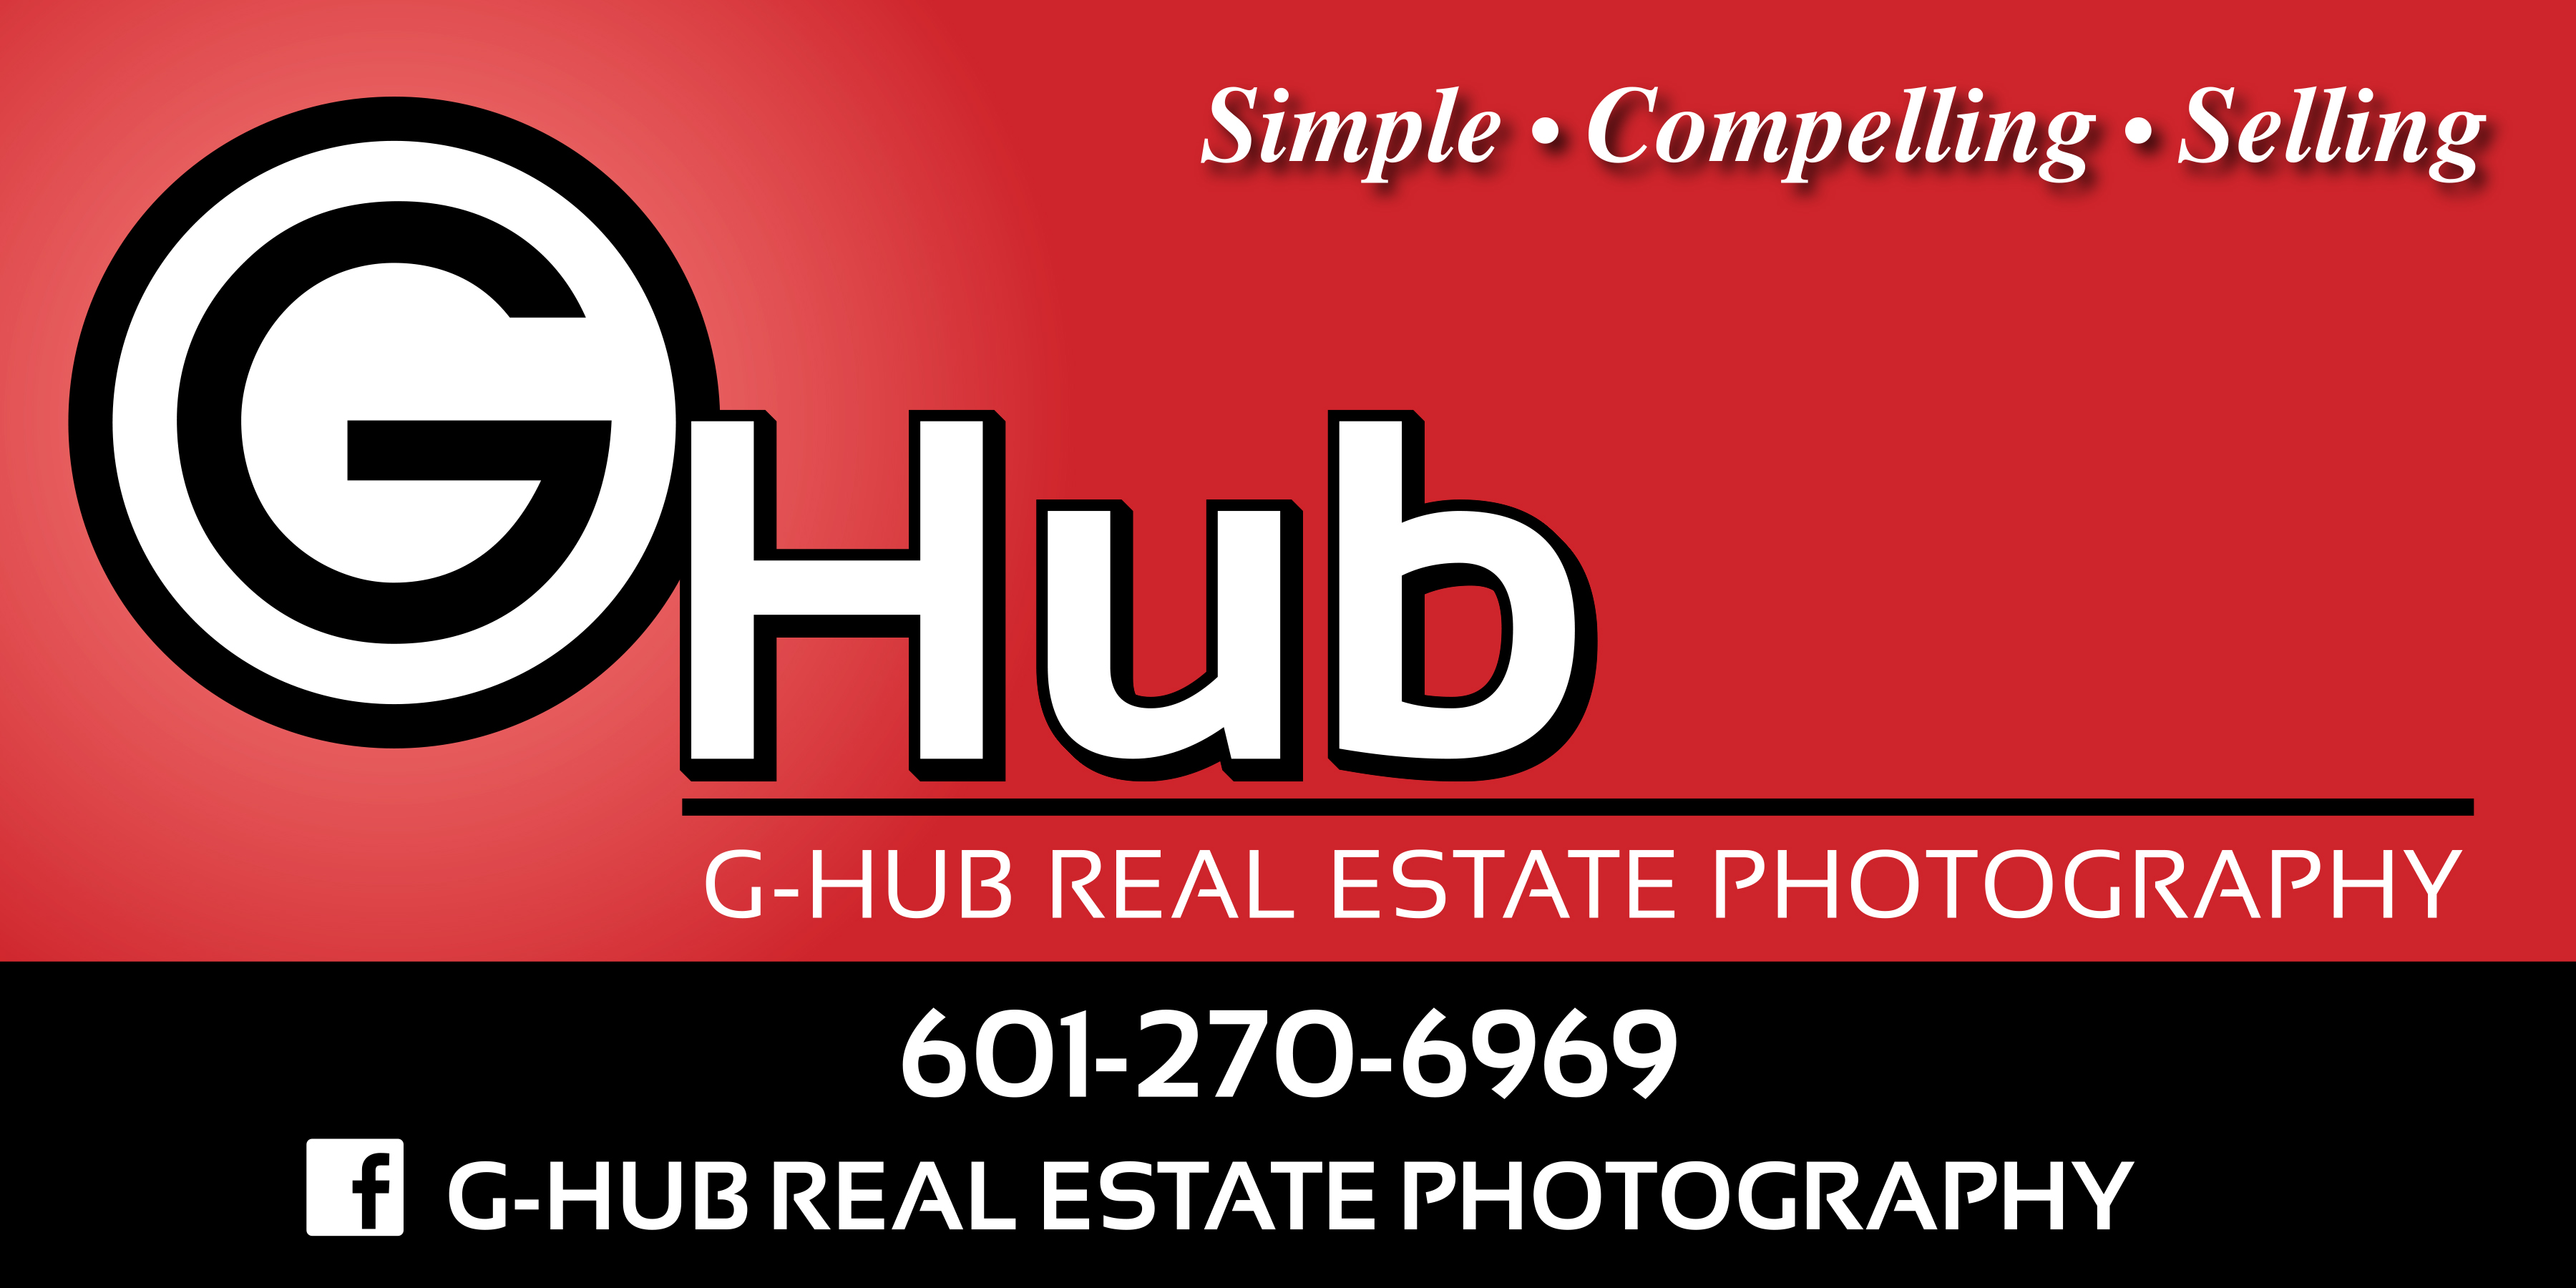 G-Hub Real Estate Photography image